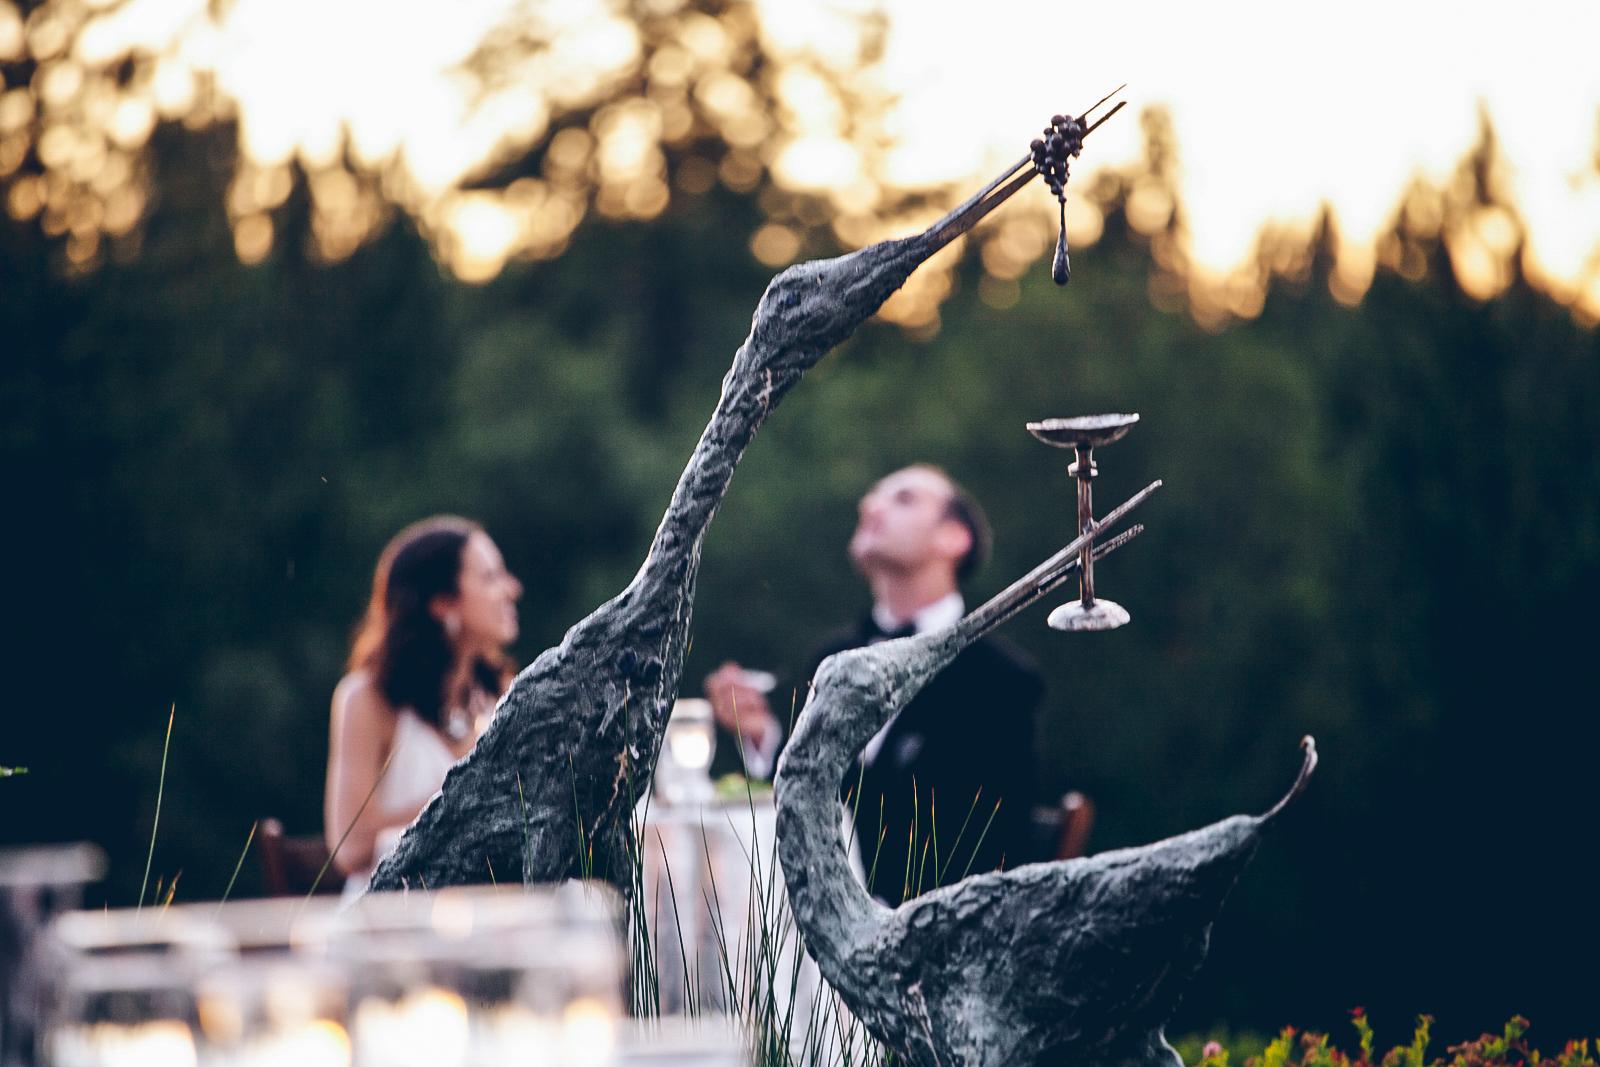 miraflores_winery_wedding_photography_ian_melissa_ebony_siovhan_bokeh_photography_69.jpg